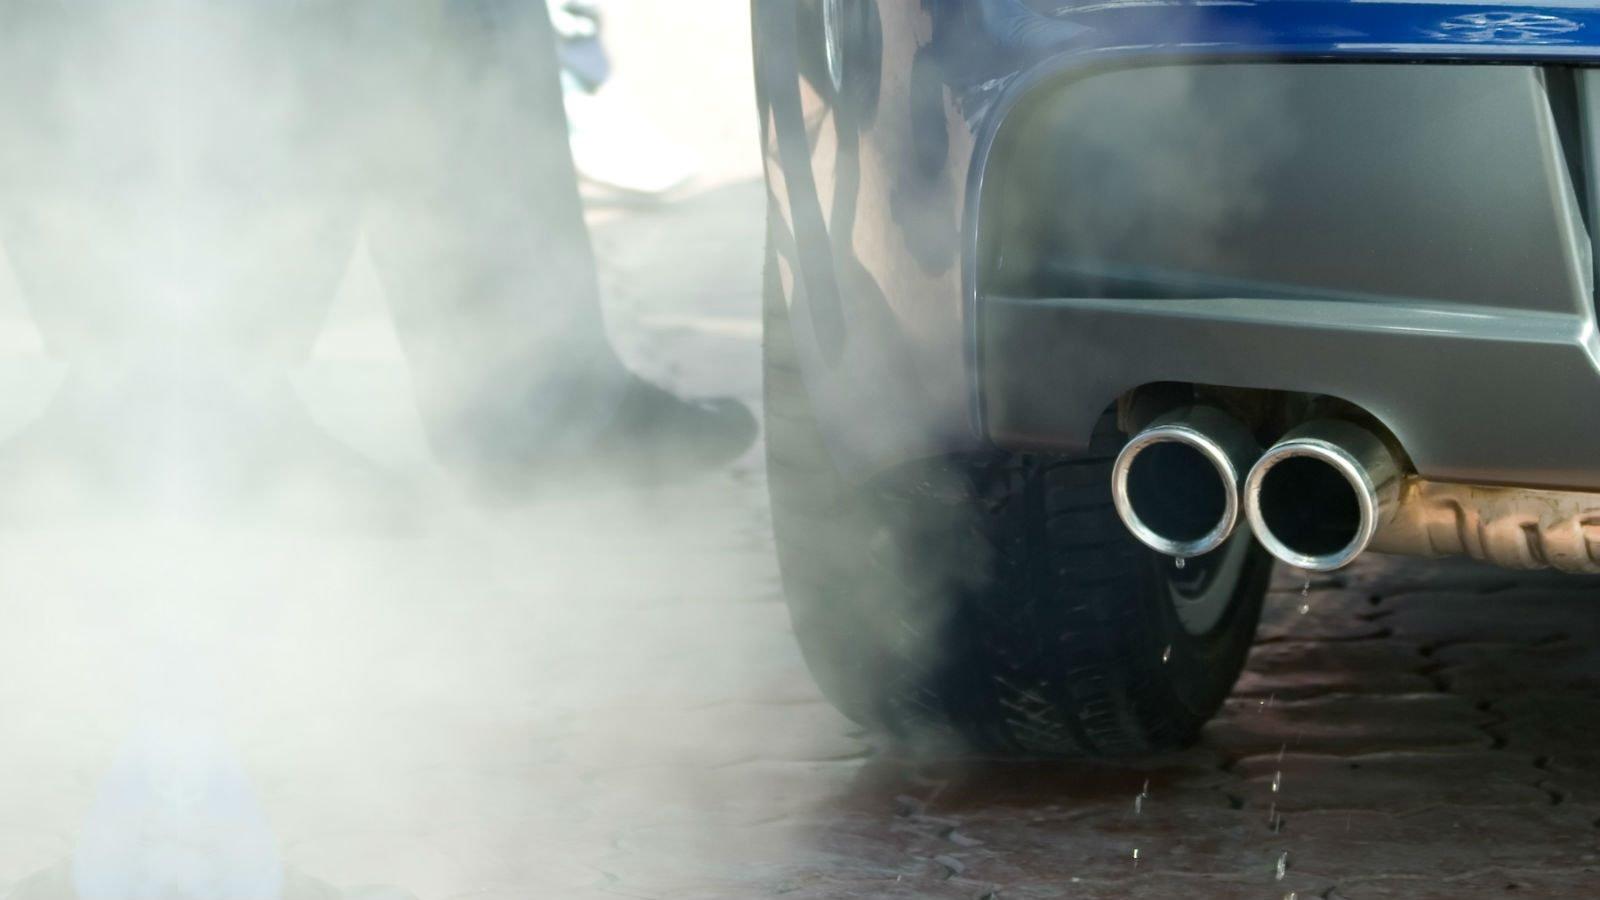 CO2 - eller kuldioxid - er både en naturlig og en menneskeskabt drivhusgas.